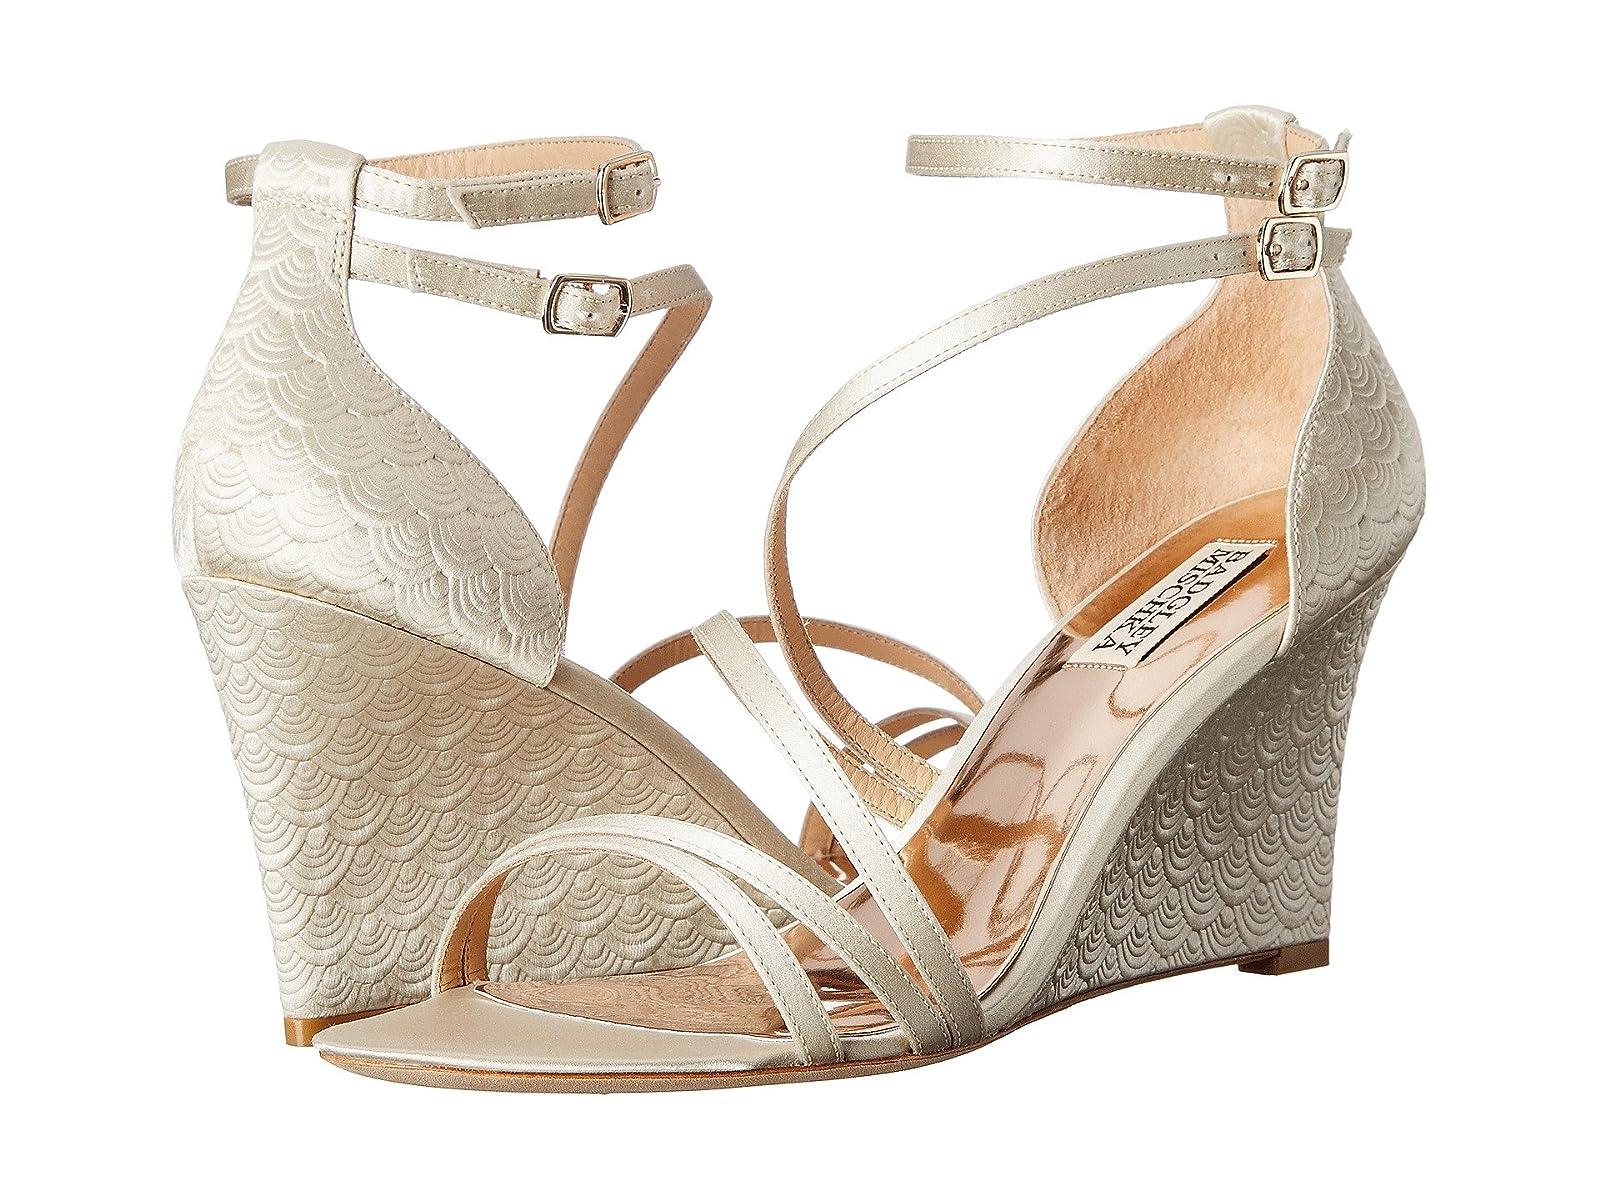 Badgley Mischka CarnationCheap and distinctive eye-catching shoes